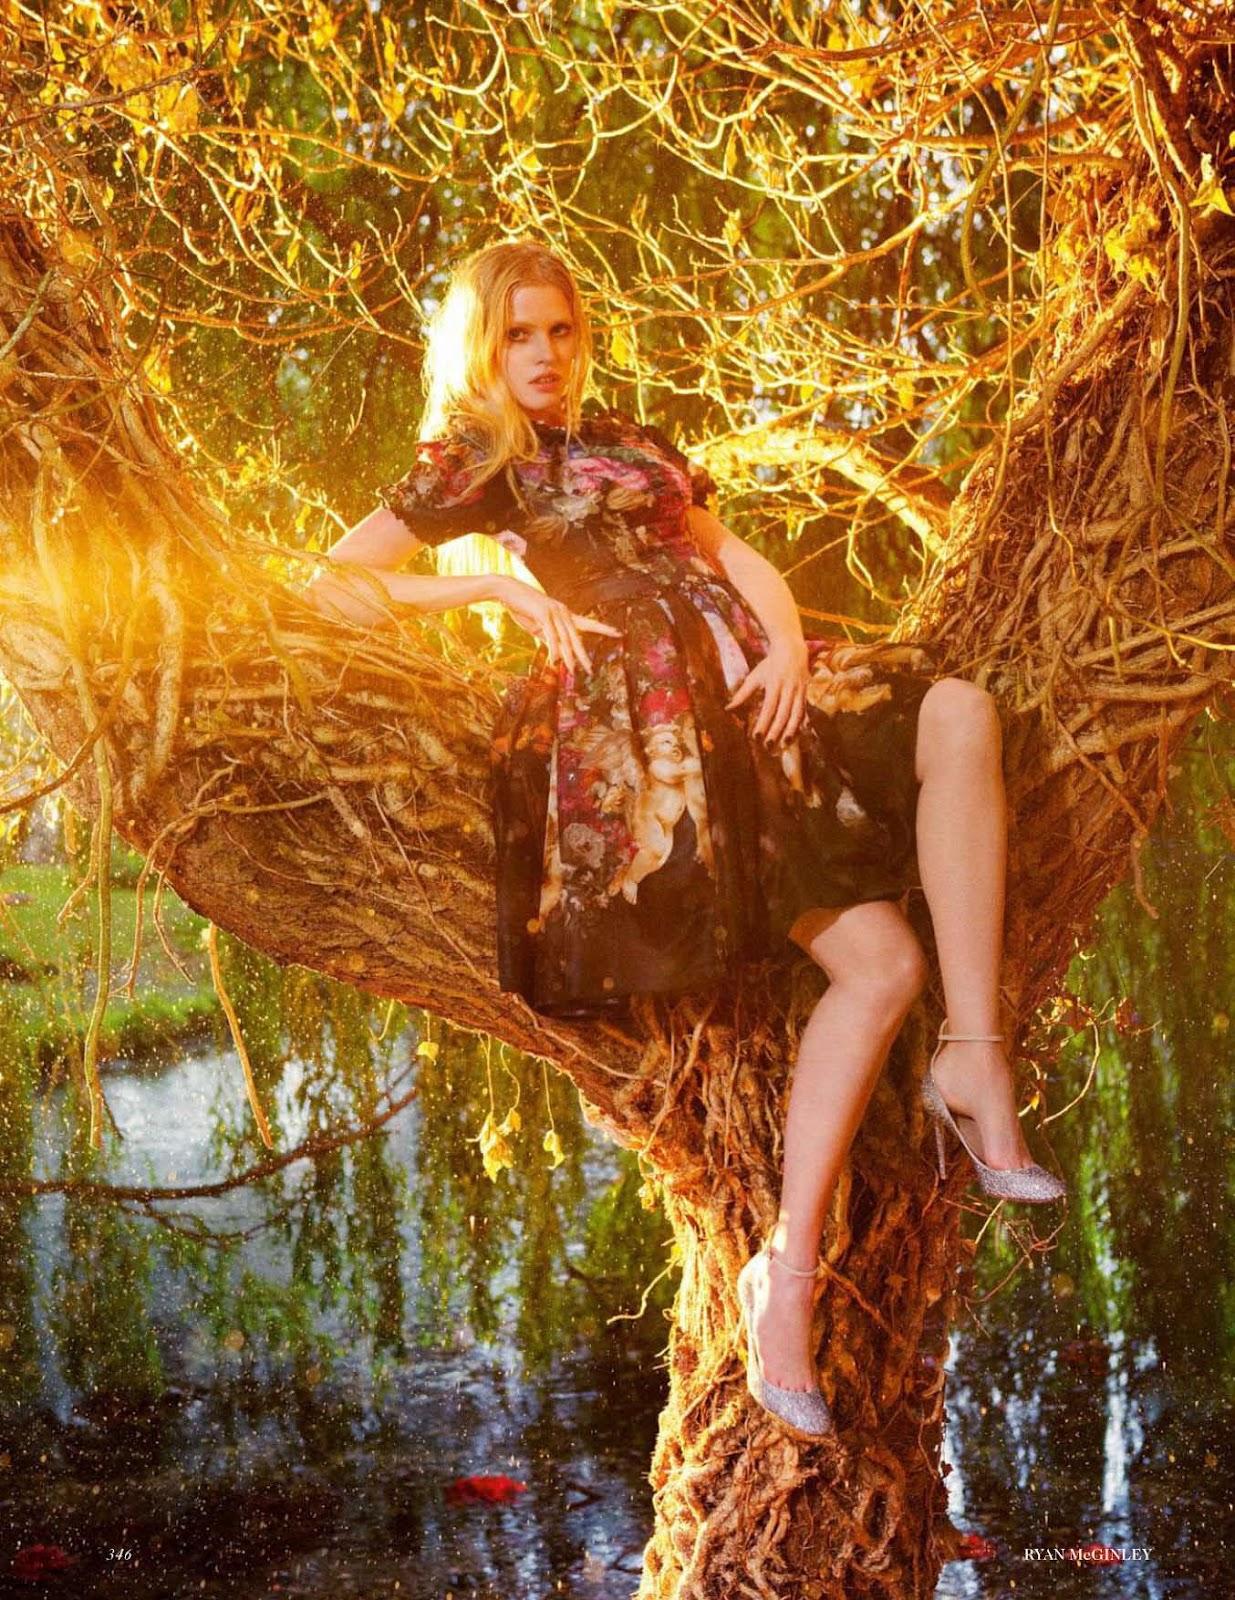 http://2.bp.blogspot.com/-8rAOECD4rxw/UCAz-nE4yBI/AAAAAAAAVN0/XtAW3agTLVg/s1600/Lara+Stone+-+Vogue+UK+September+2012+4.jpg